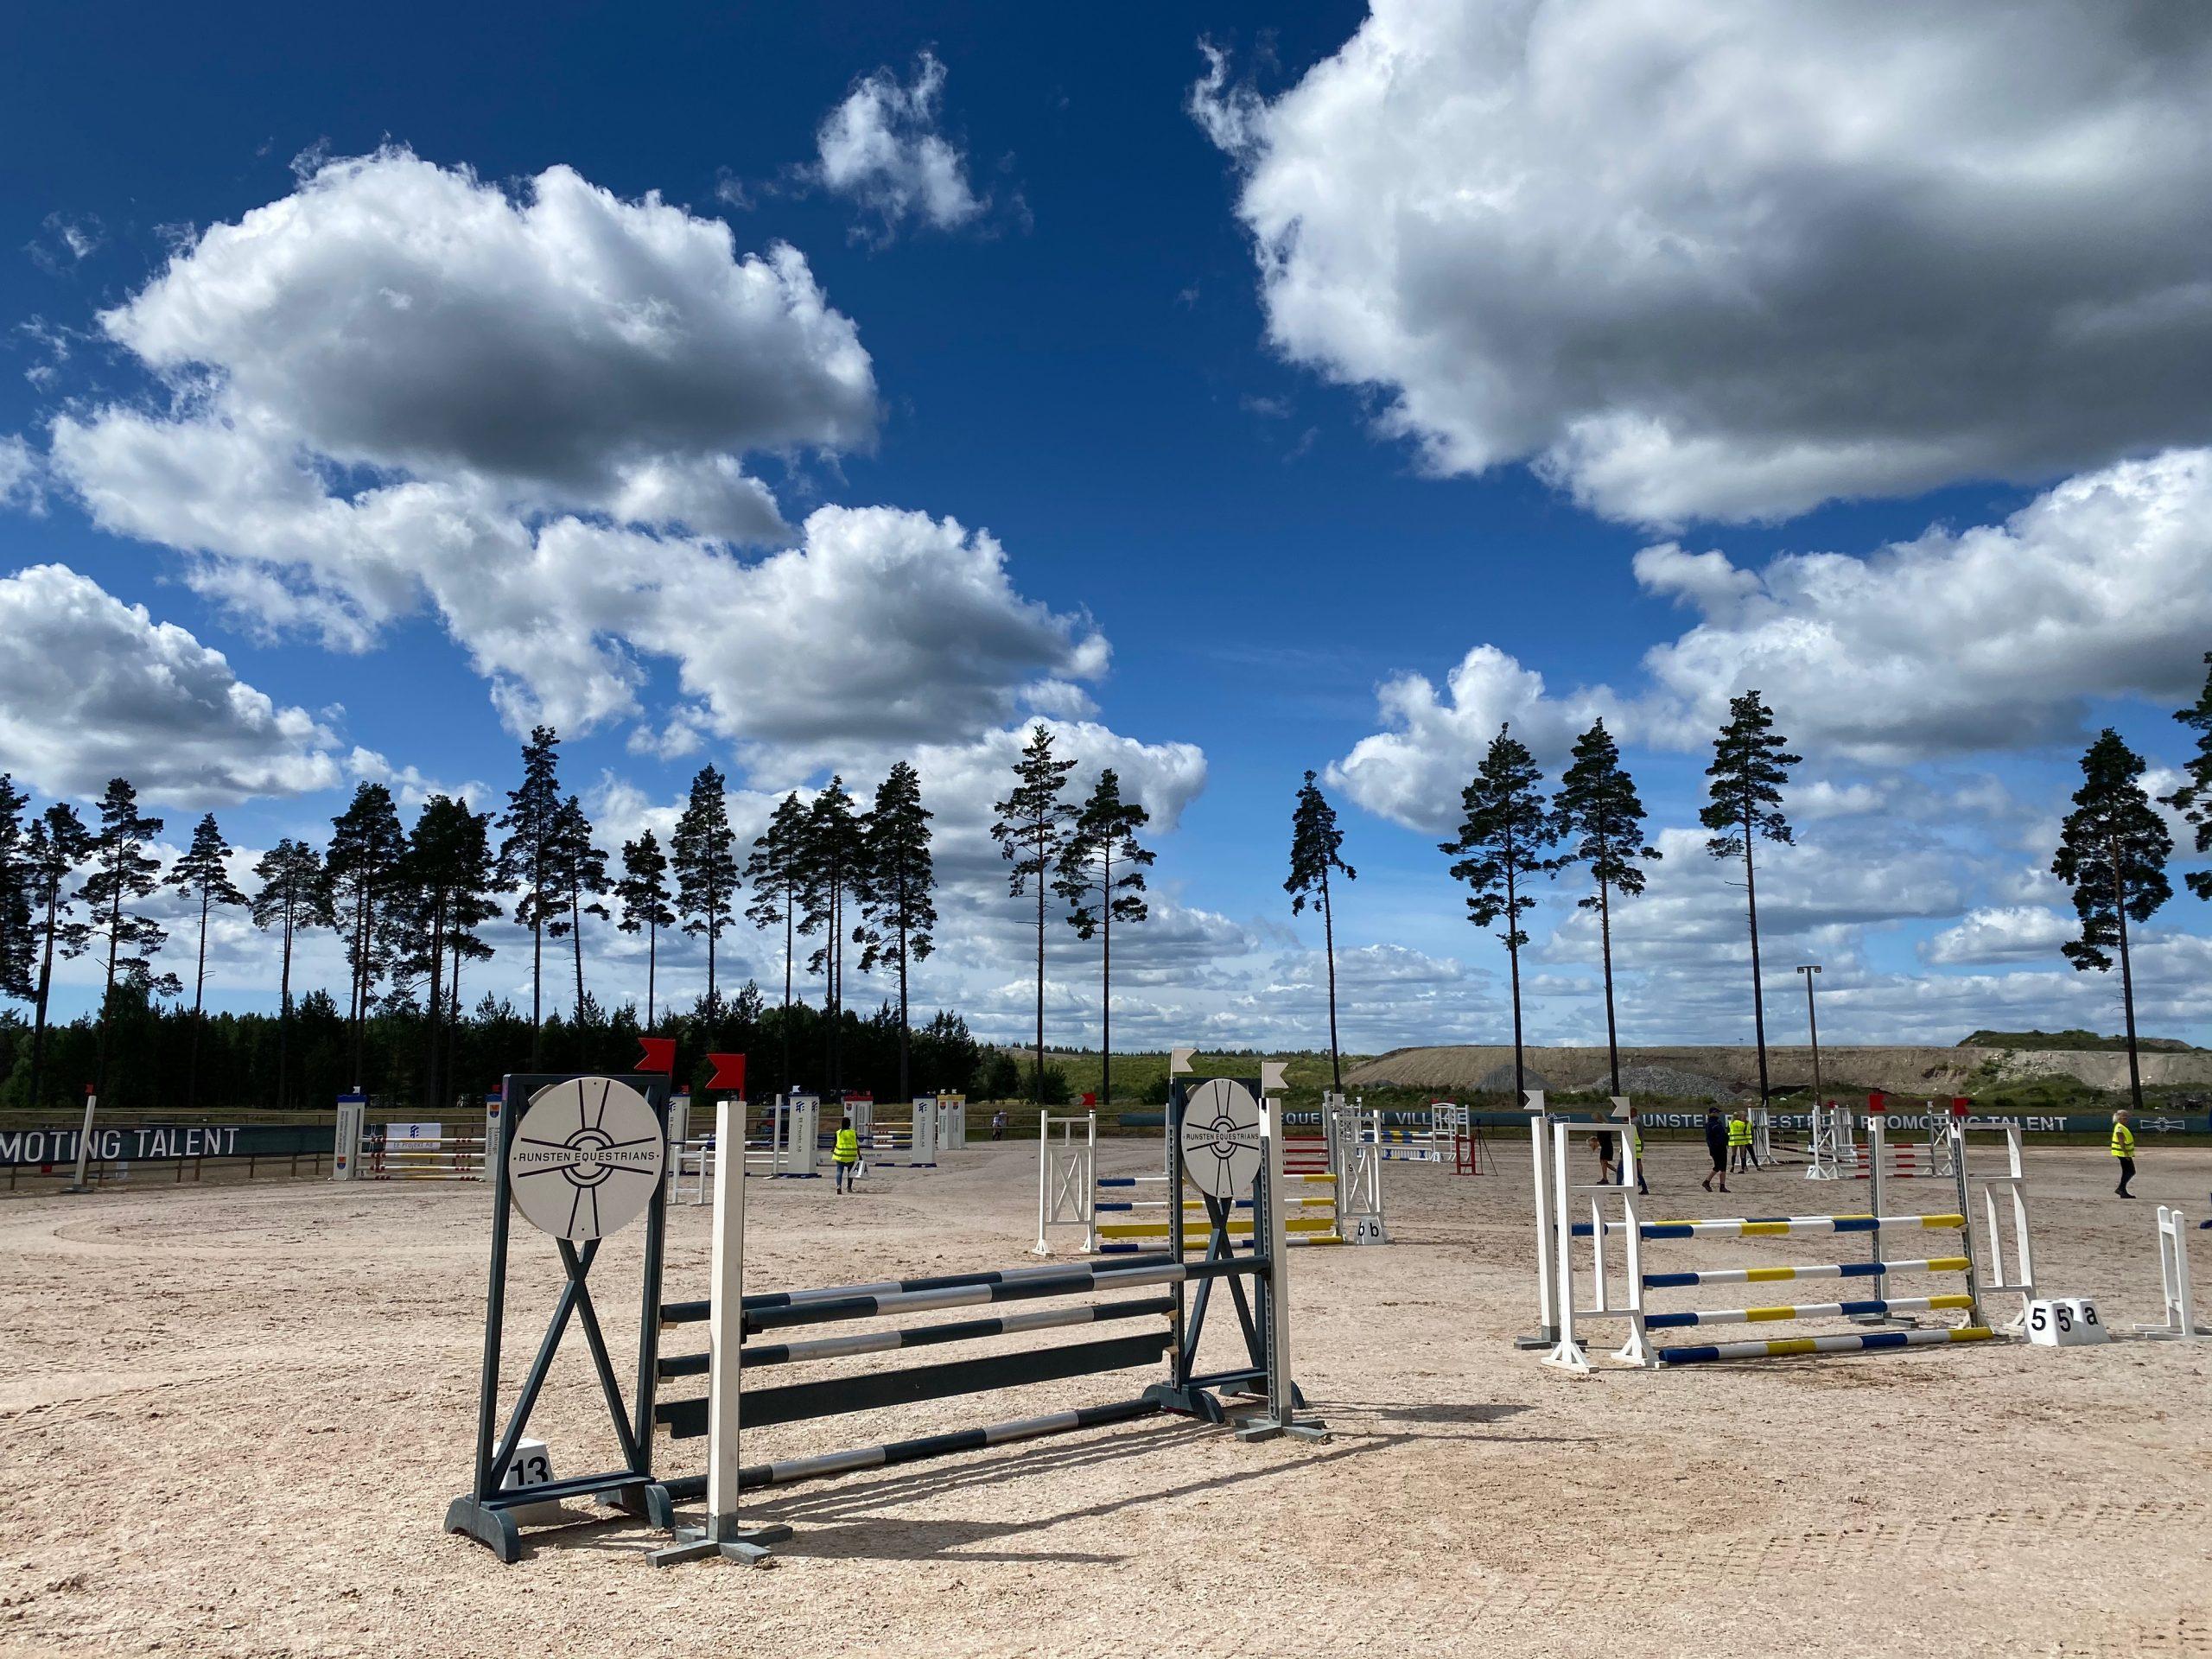 Ponnyhoppning & Ponnyallsvenskan Div 1 på Runsten